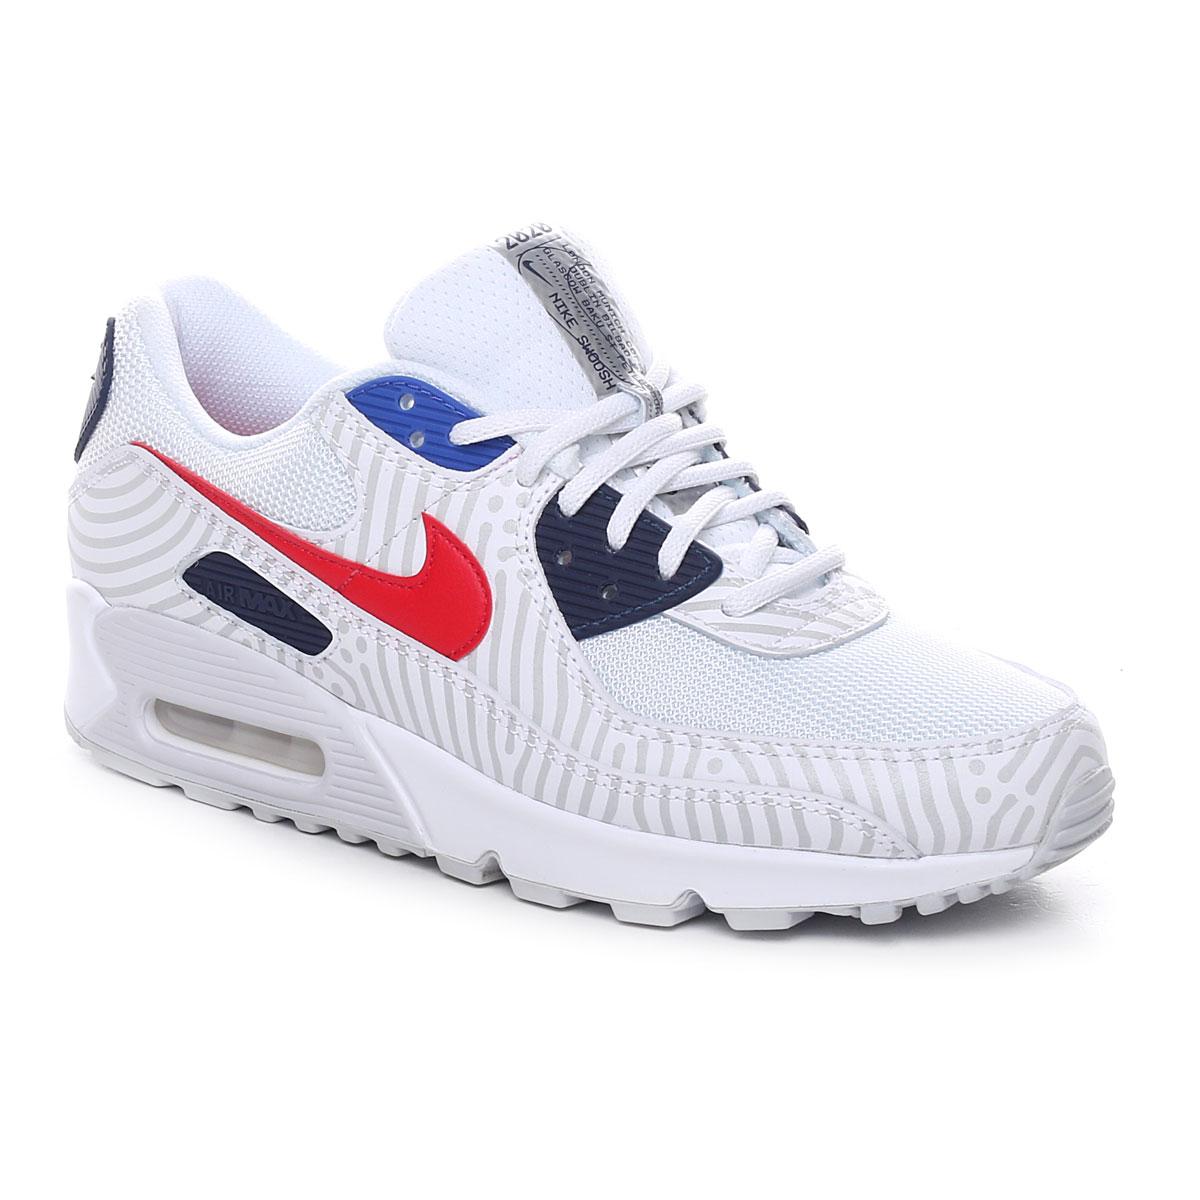 Nike Air Max 90 Uomo Bianco Grigio